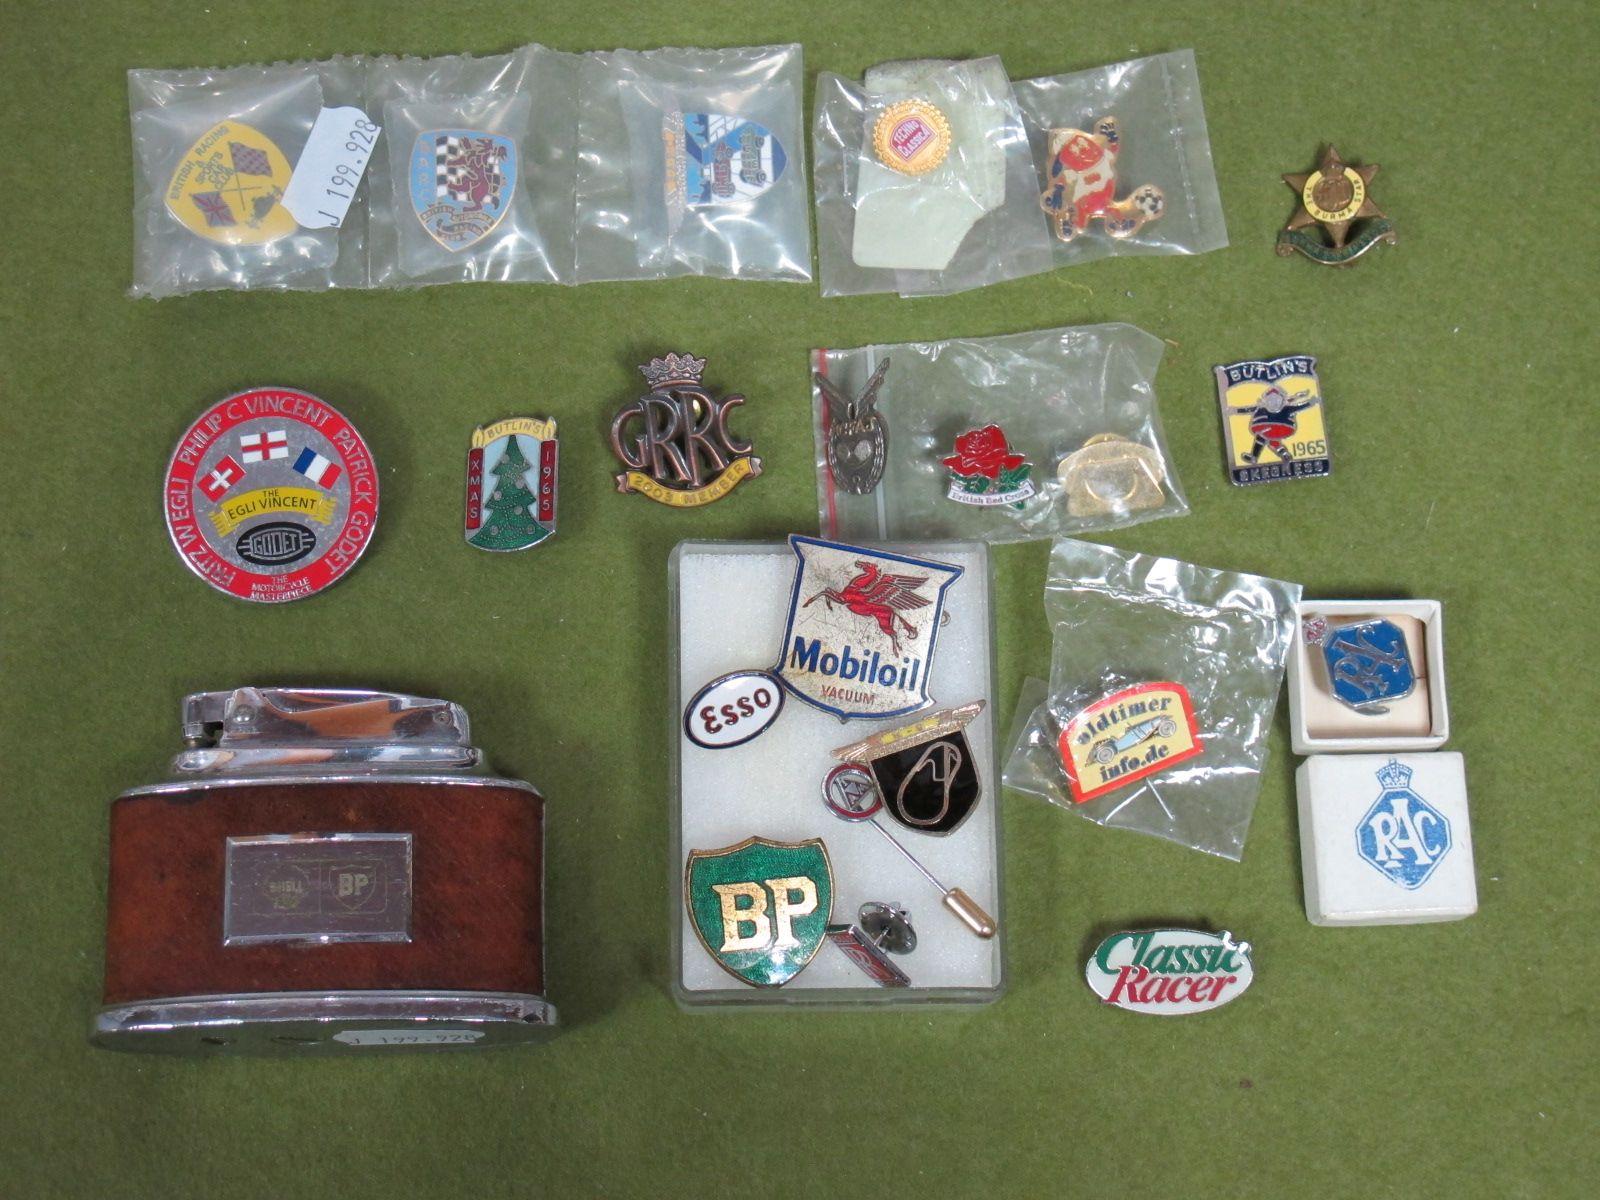 Lot 29 - Twenty Two Lapel Badges, predominately Automobile themes including Rolls Royce, BP, Mobil Oil, BARC,